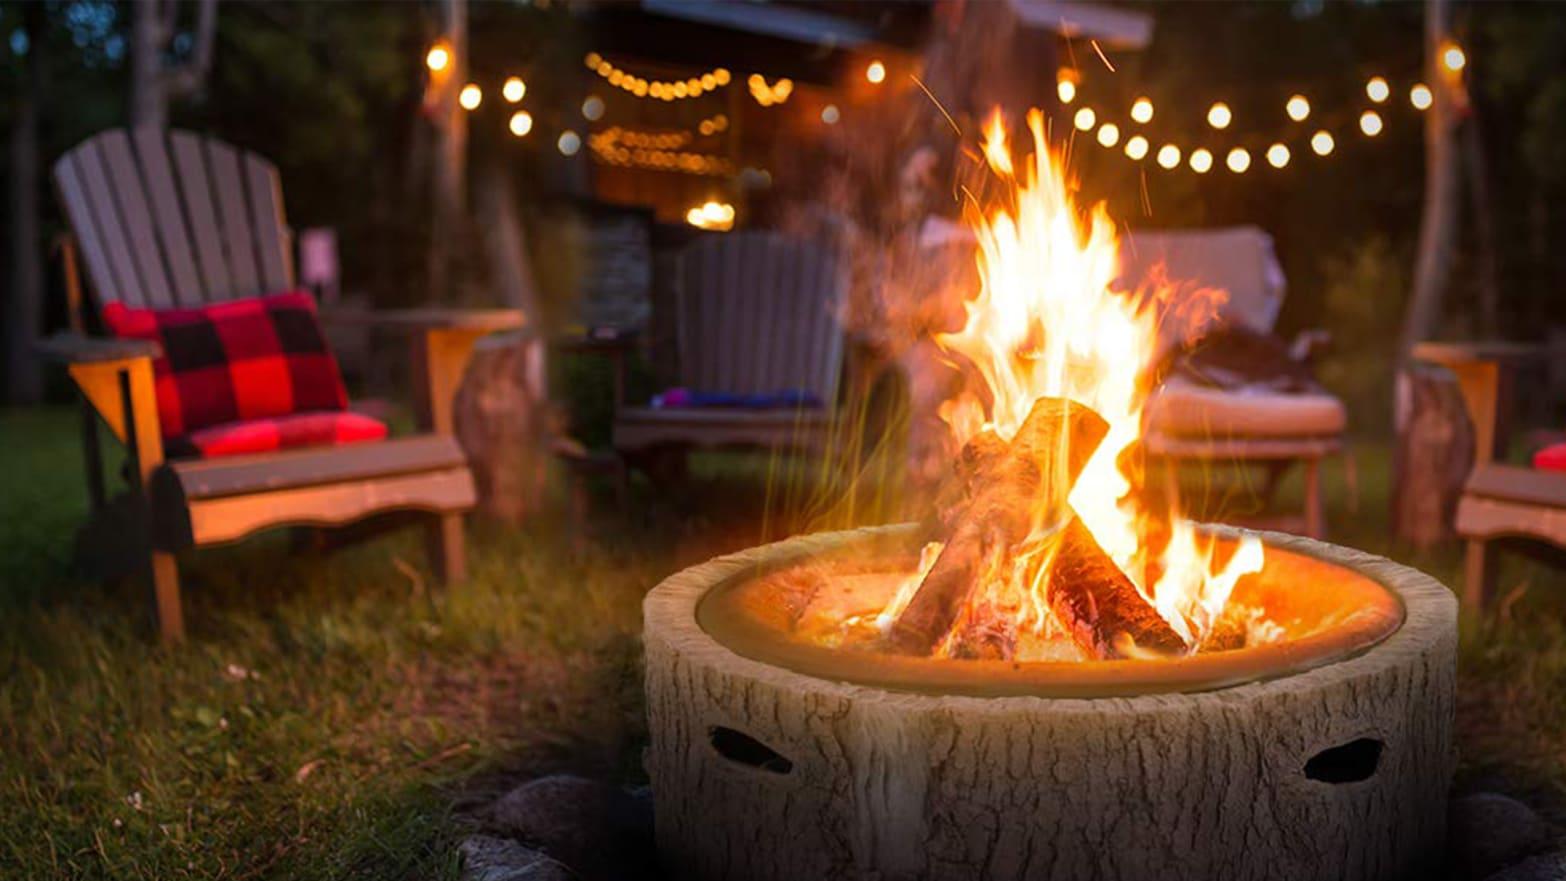 Save Nearly $200 on Martha Stewart's Fire Pit on Amazon